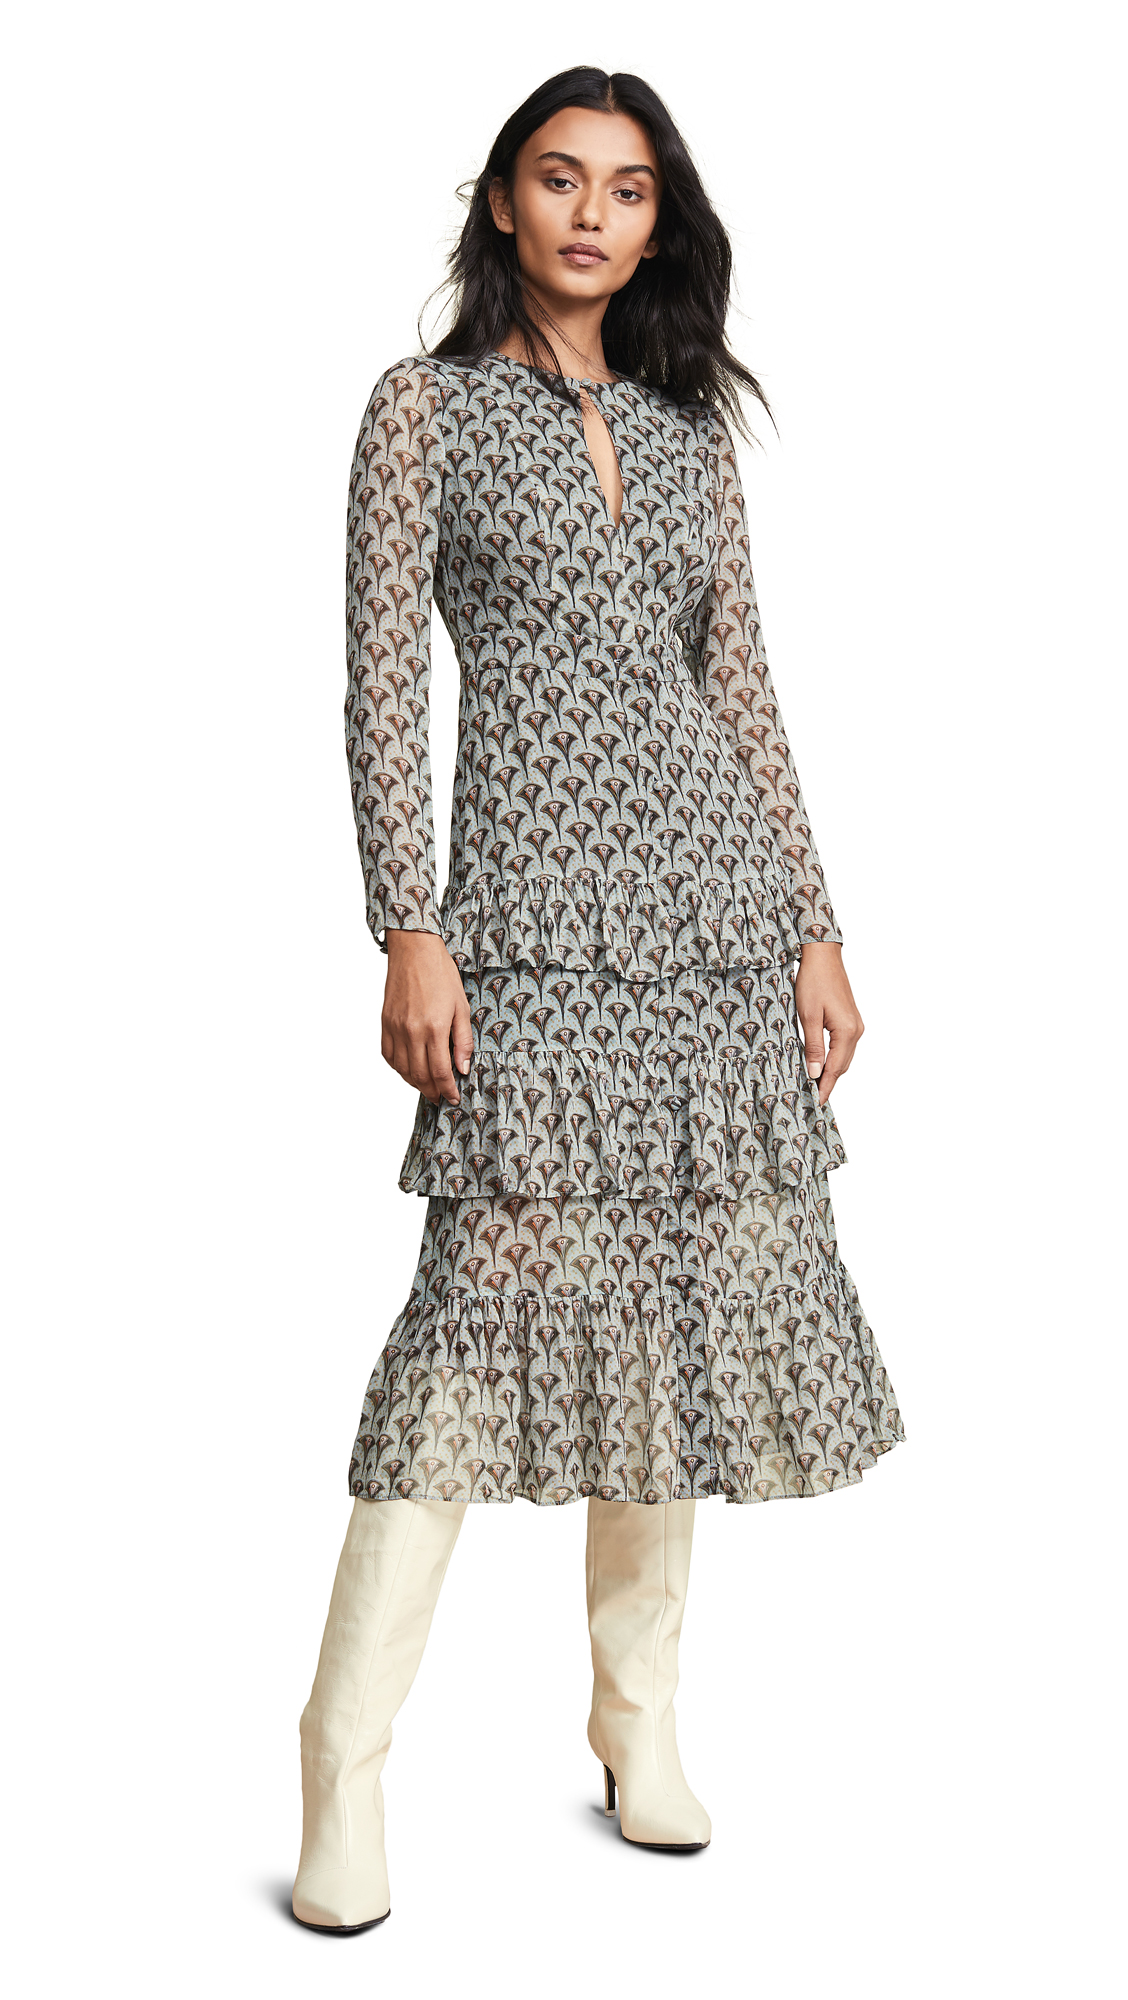 Alexis Junno Dress - Art Deco Sage